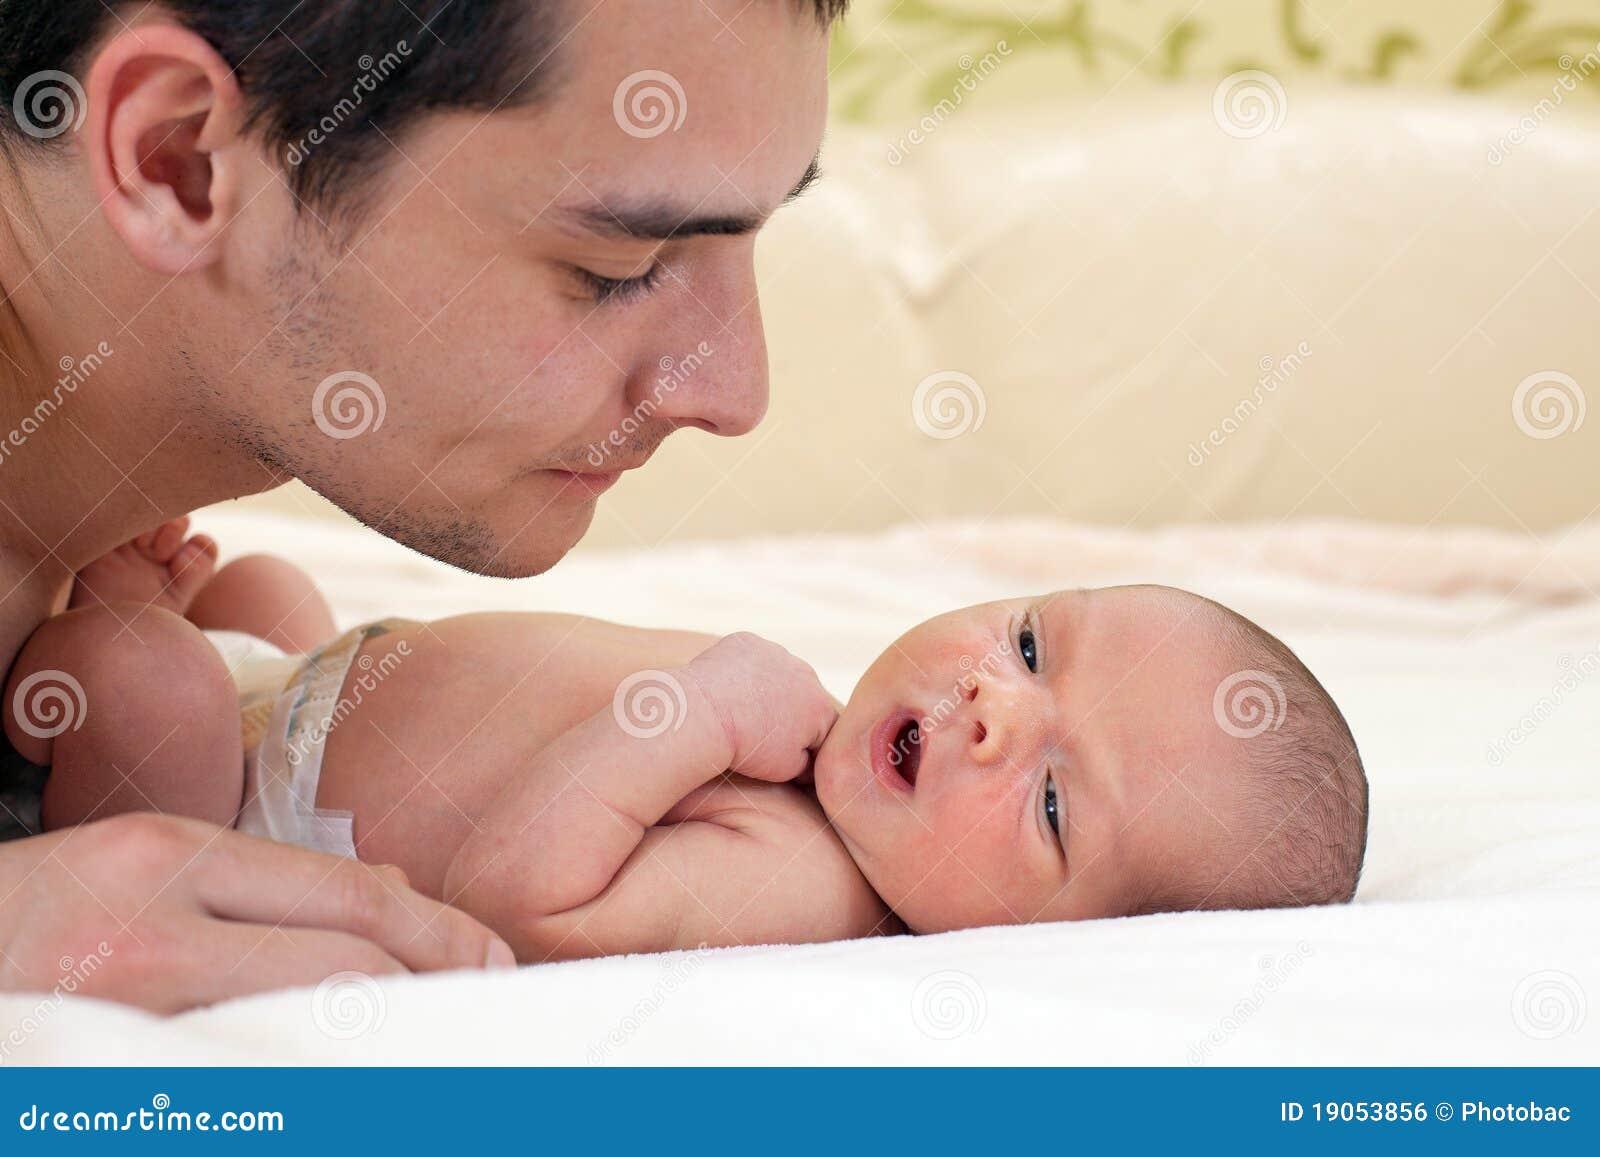 junger vater und neugeborenes baby stockfoto bild von obacht familie 19053856. Black Bedroom Furniture Sets. Home Design Ideas